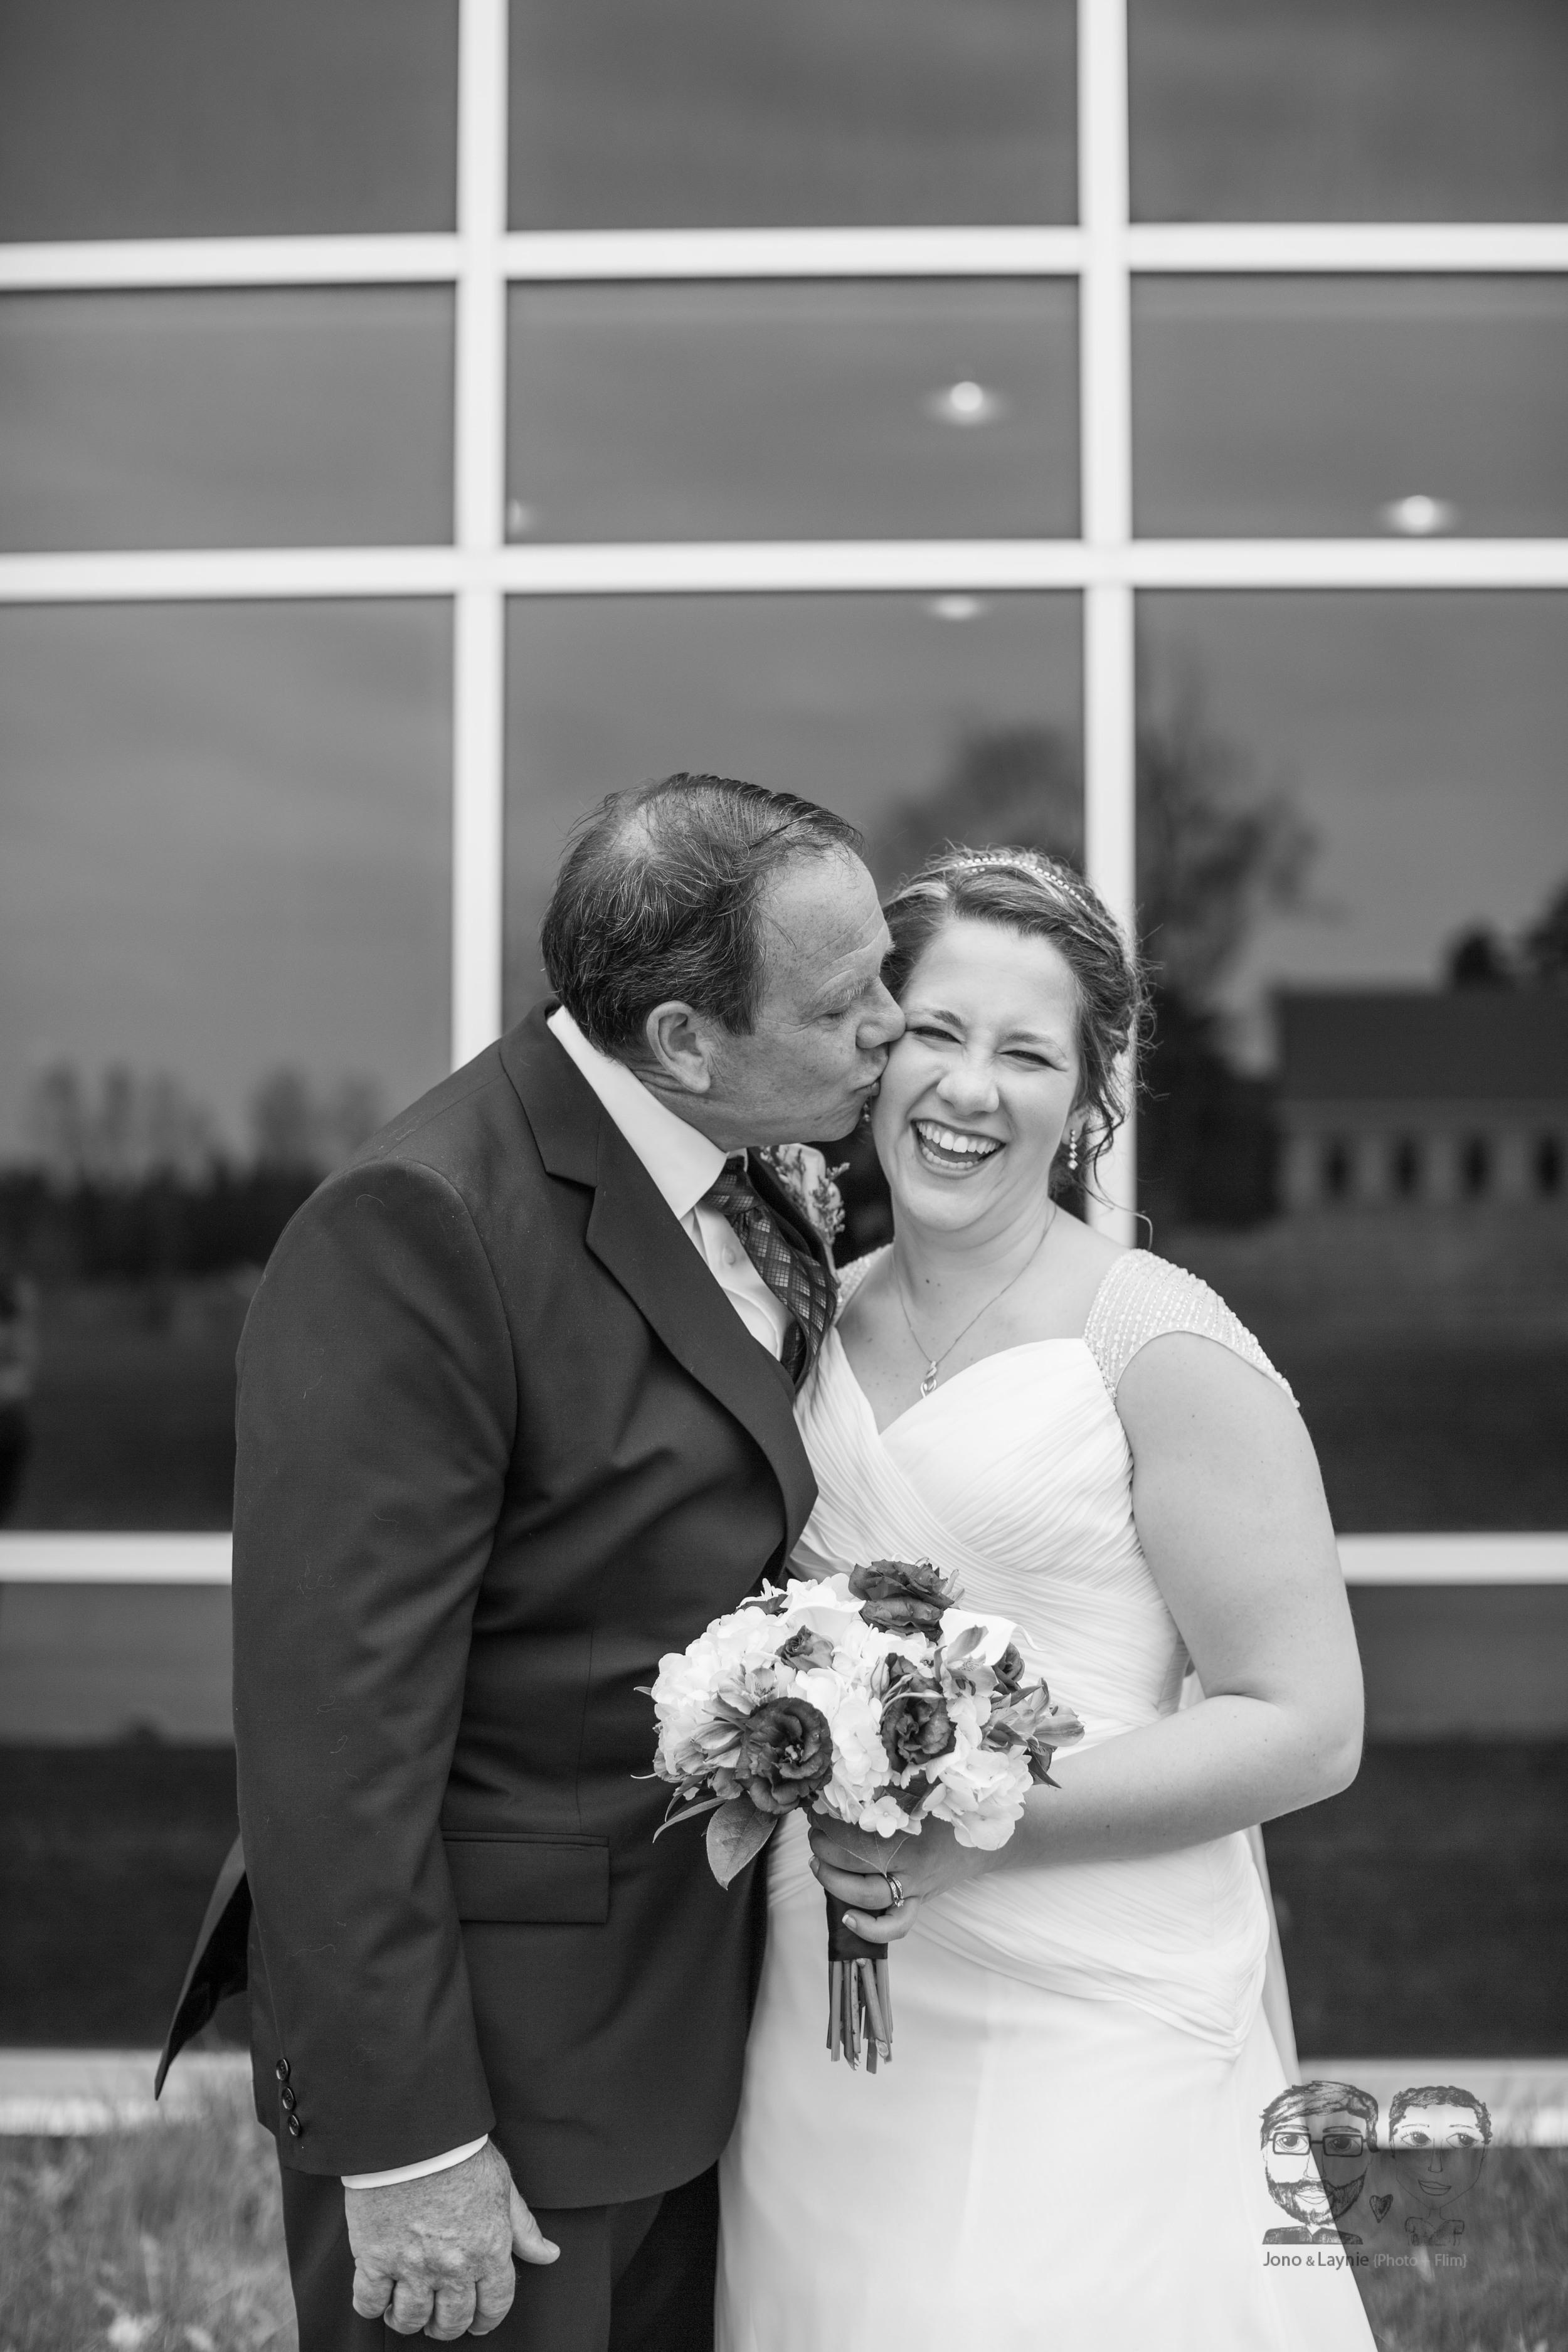 18Toronto Wedding Photographers and Videographers-Jono & Laynie Co.-Orangeville Wedding.jpg